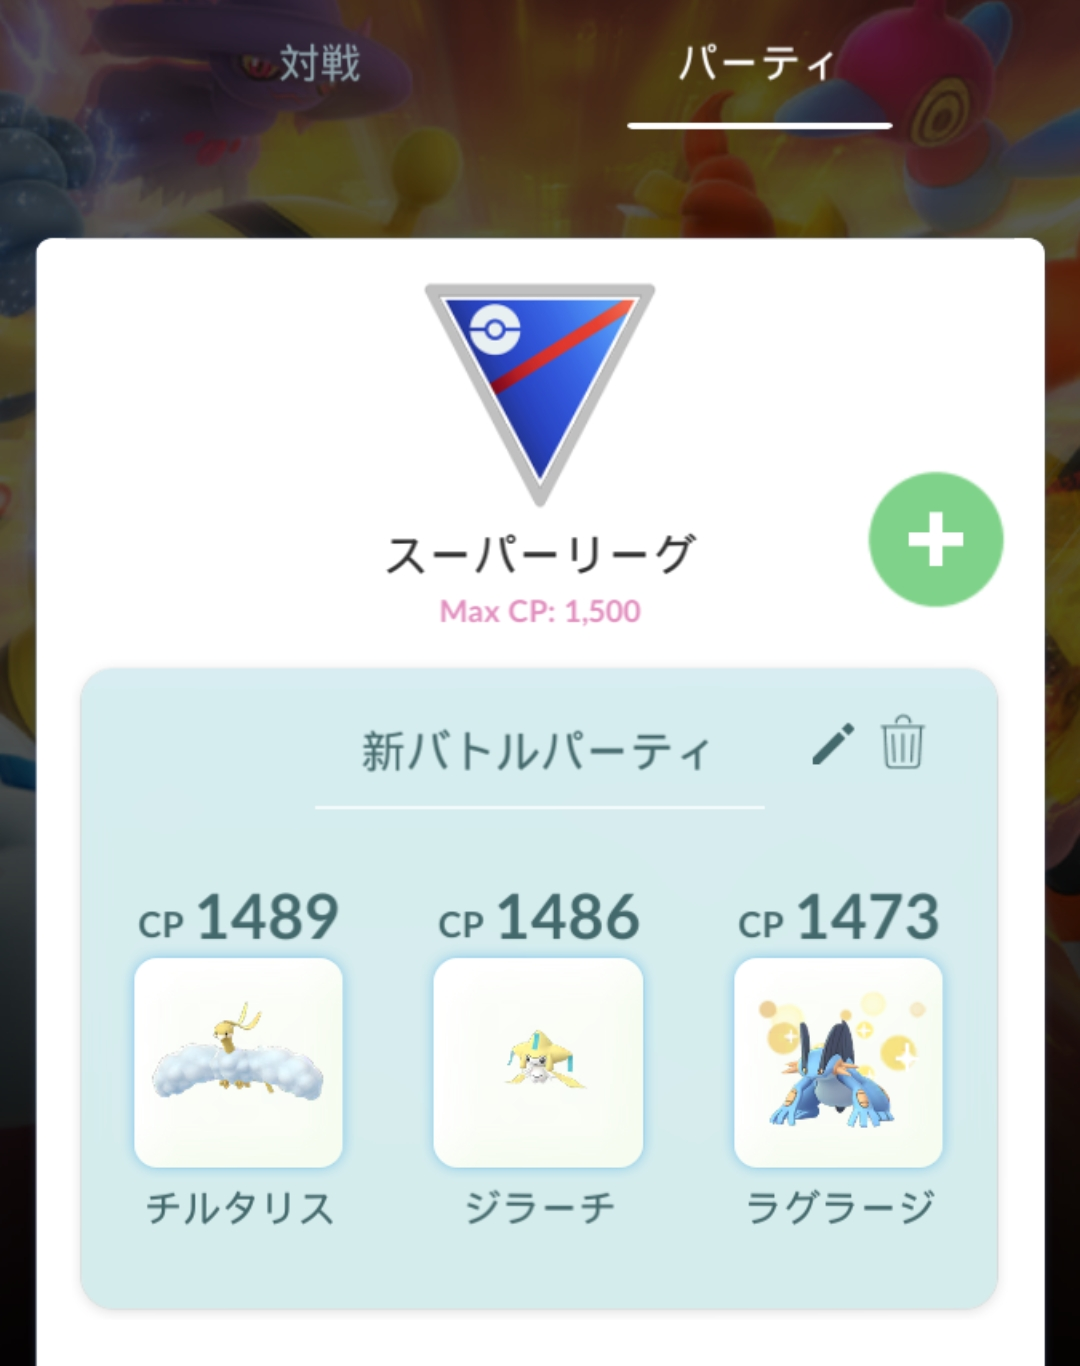 Go リーグ パーティ ハイパー ポケモン